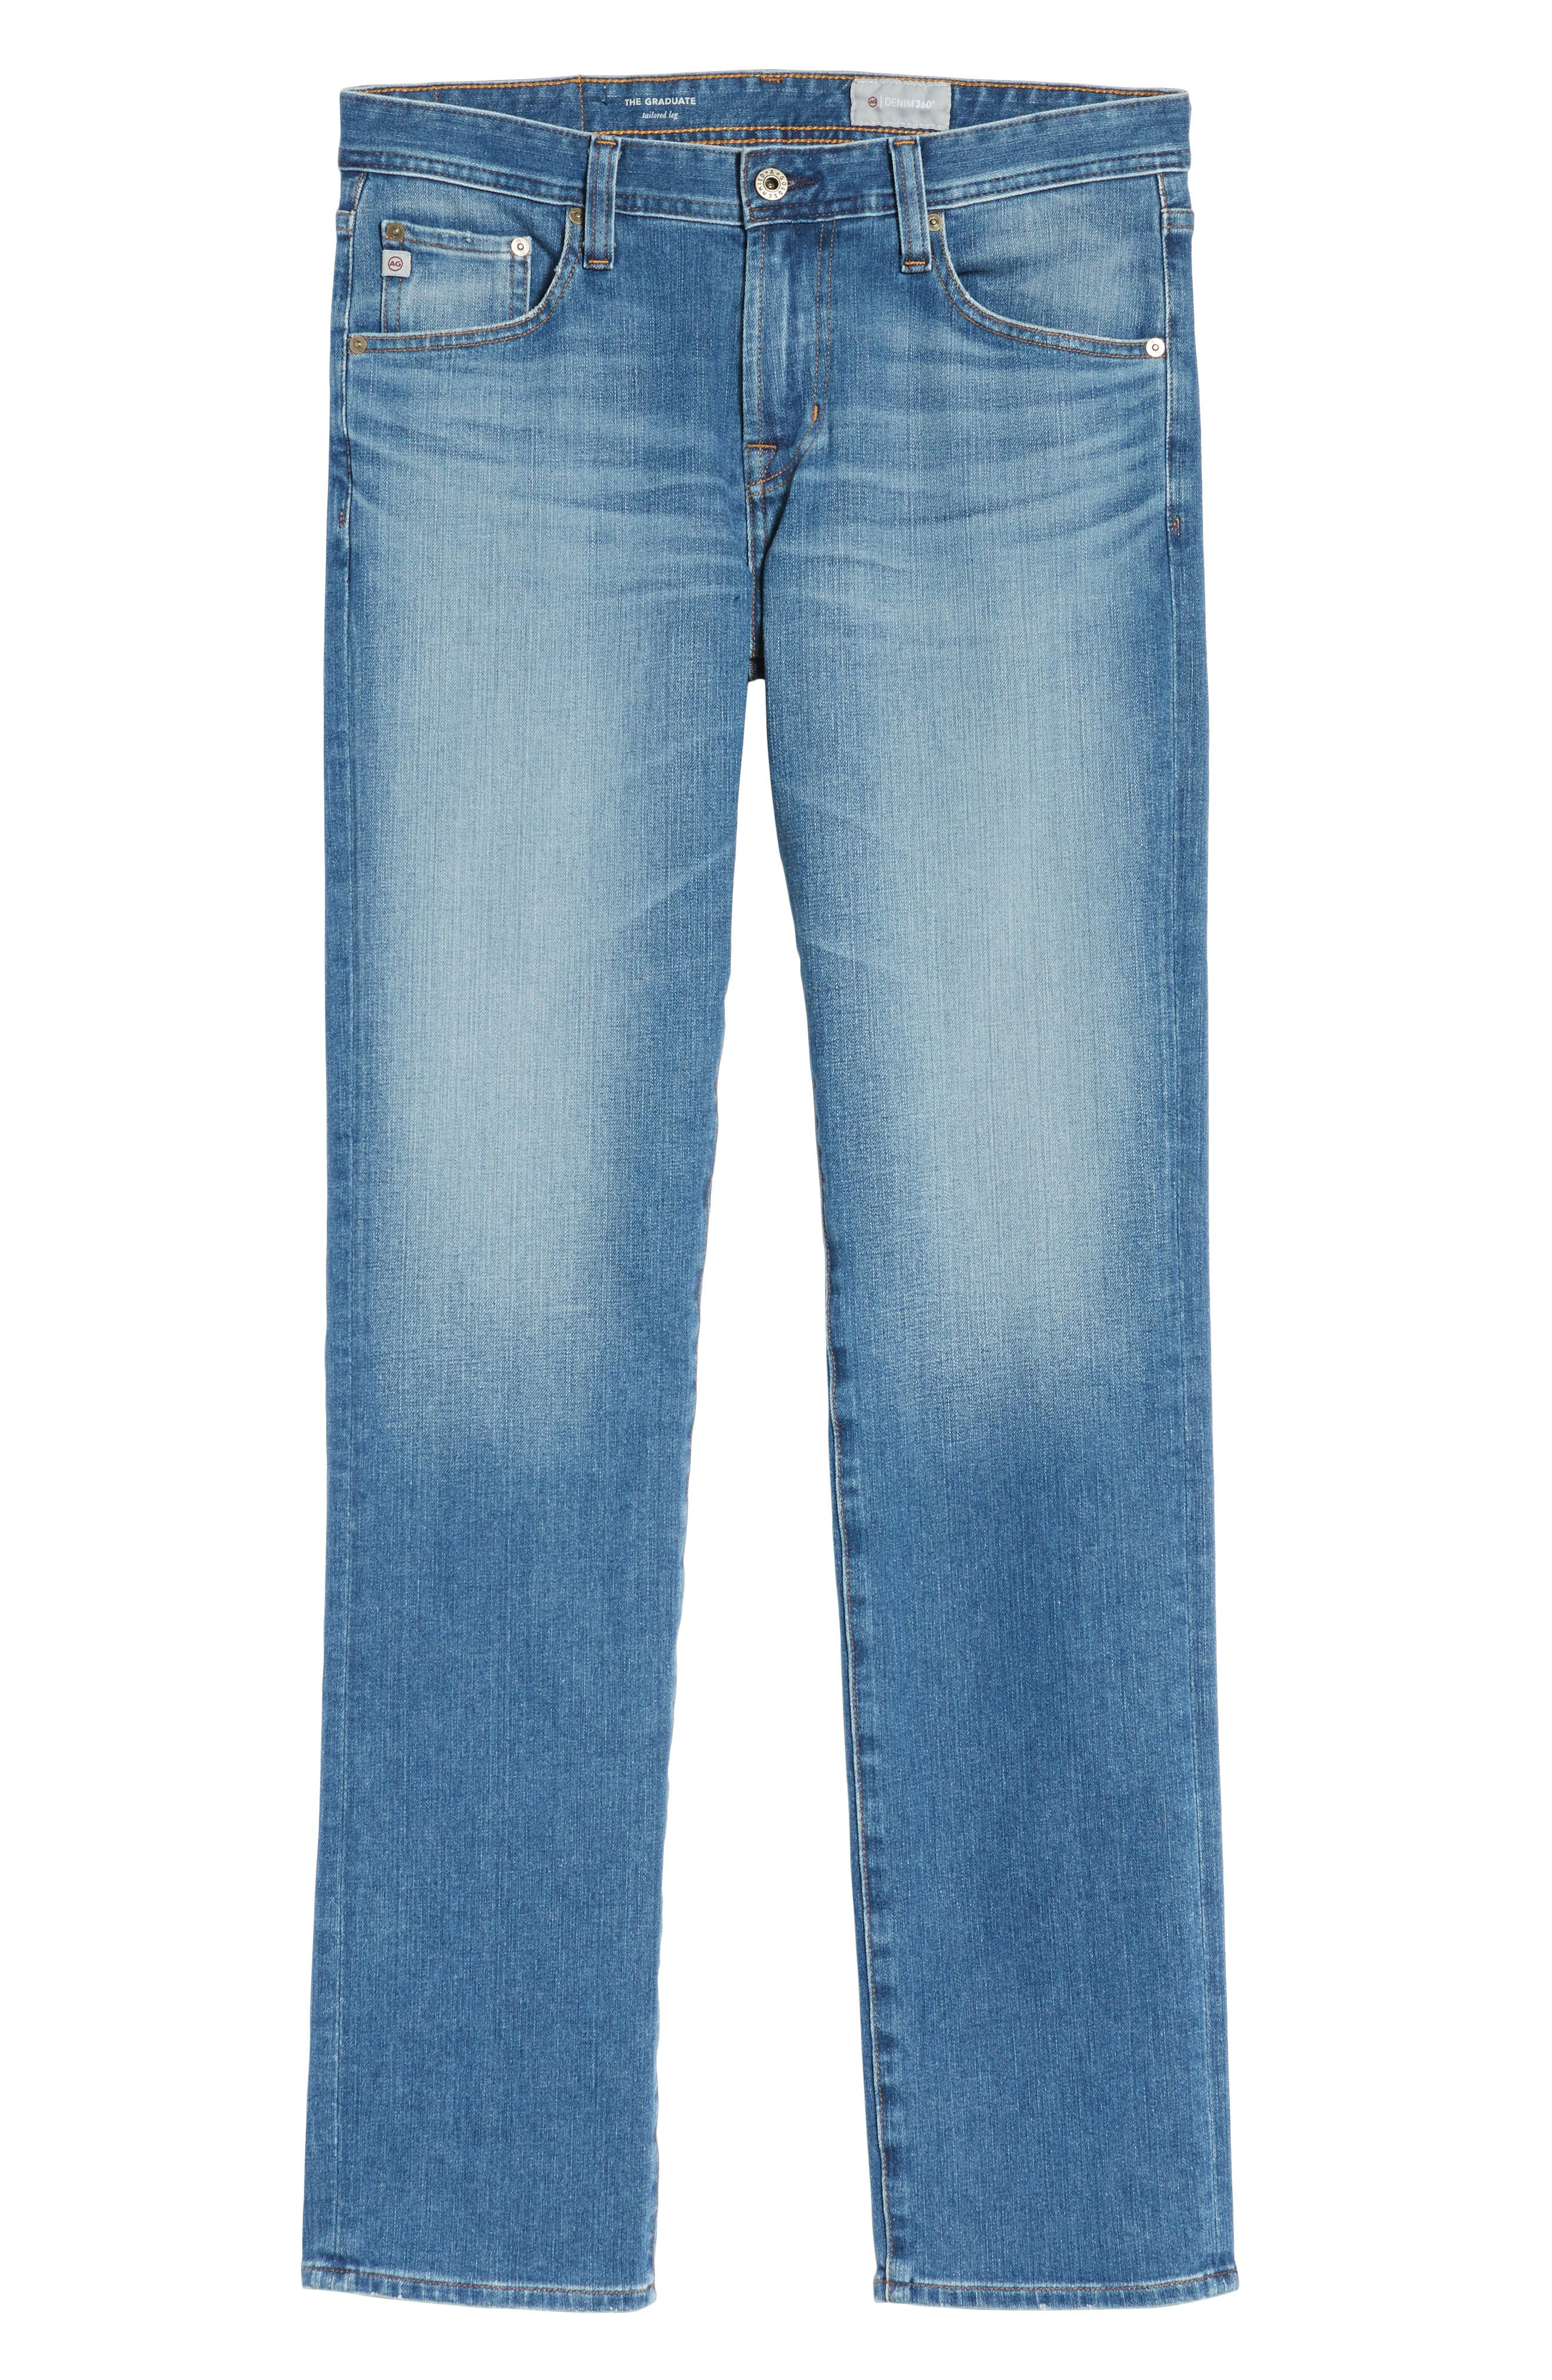 Graduate Slim Straight Fit Jeans,                             Alternate thumbnail 6, color,                             456